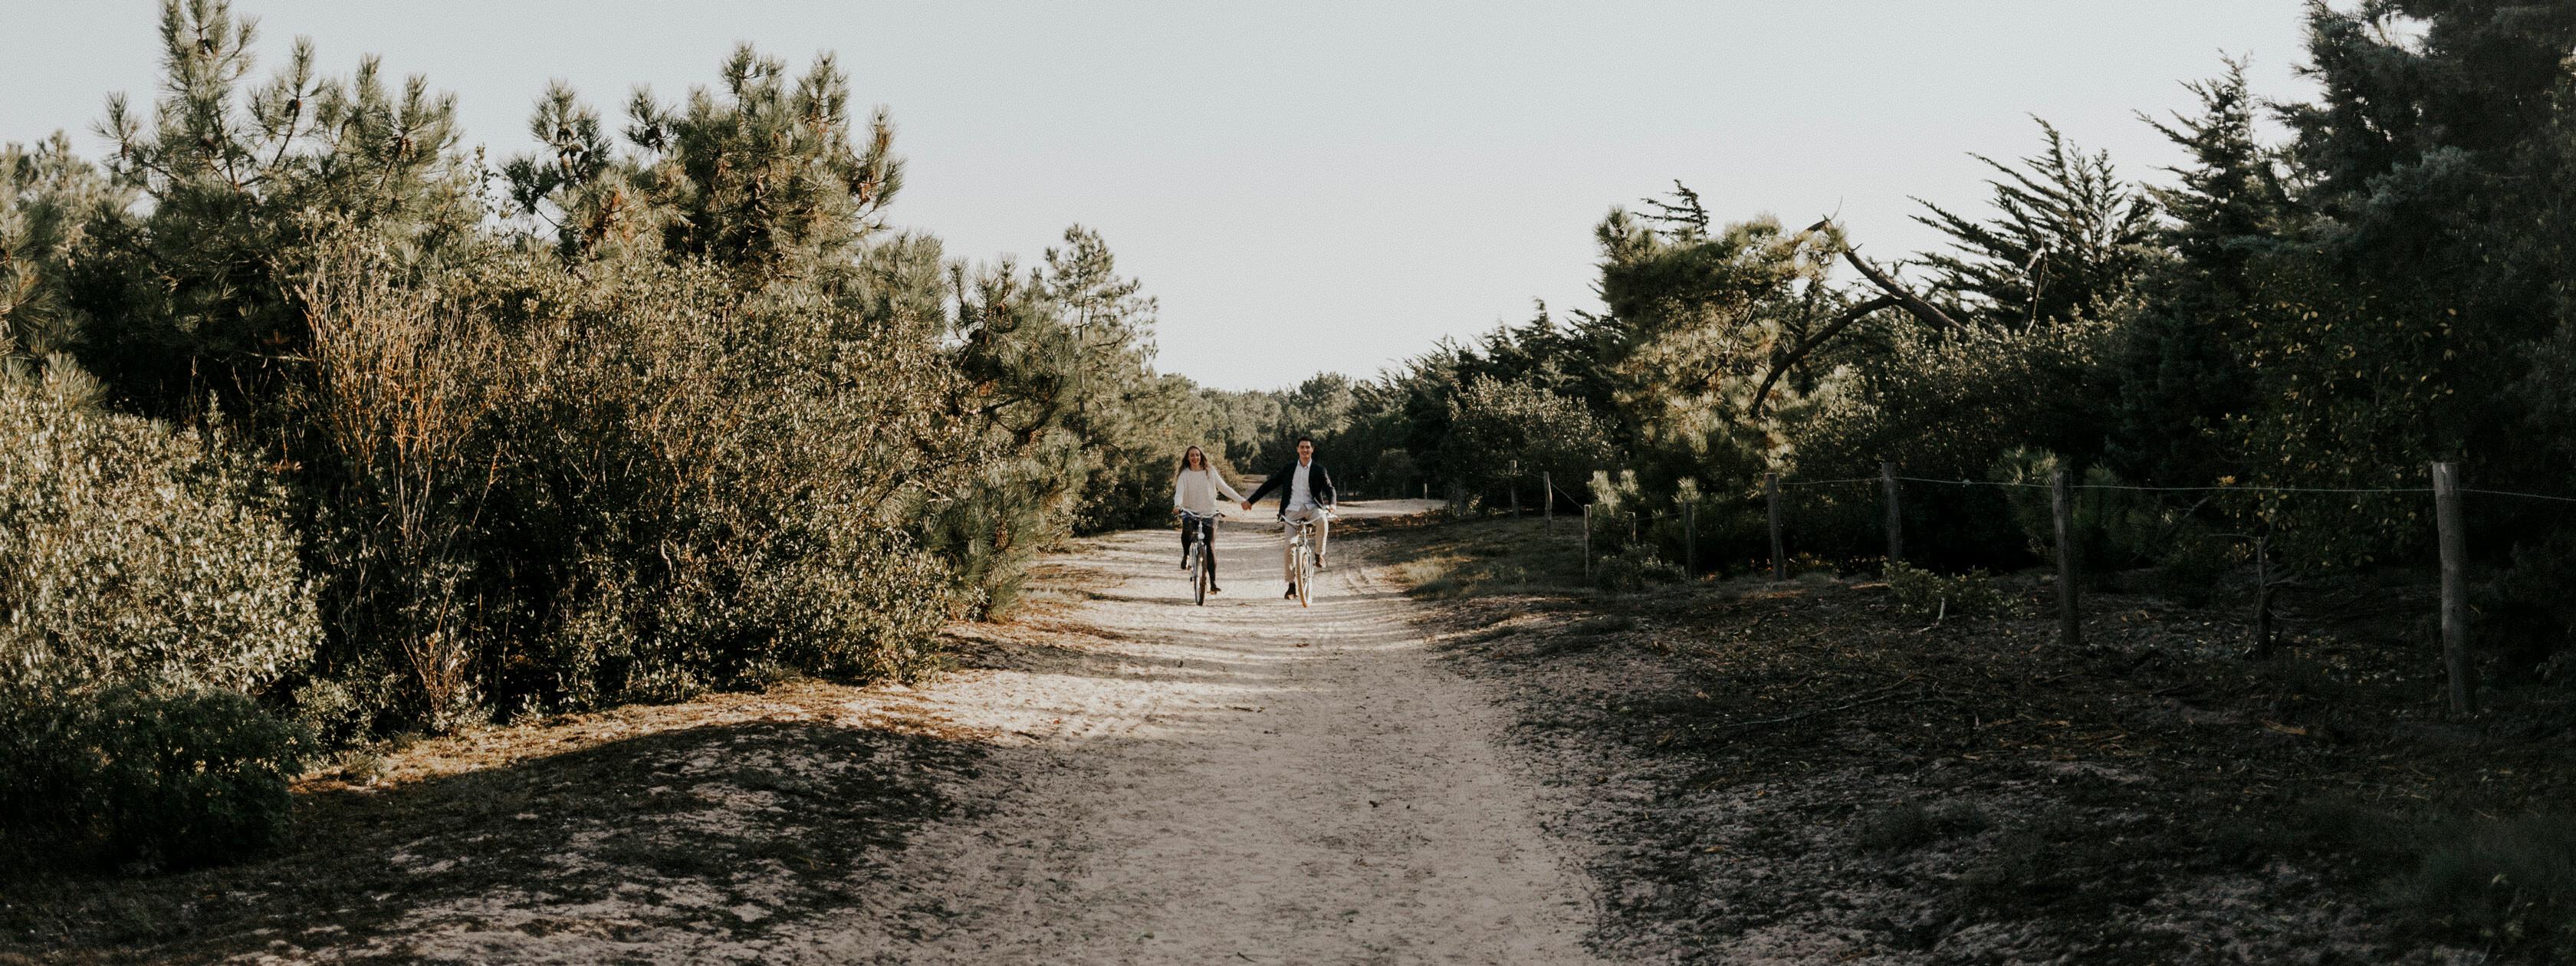 Fotobuch Verlobung Rosemood